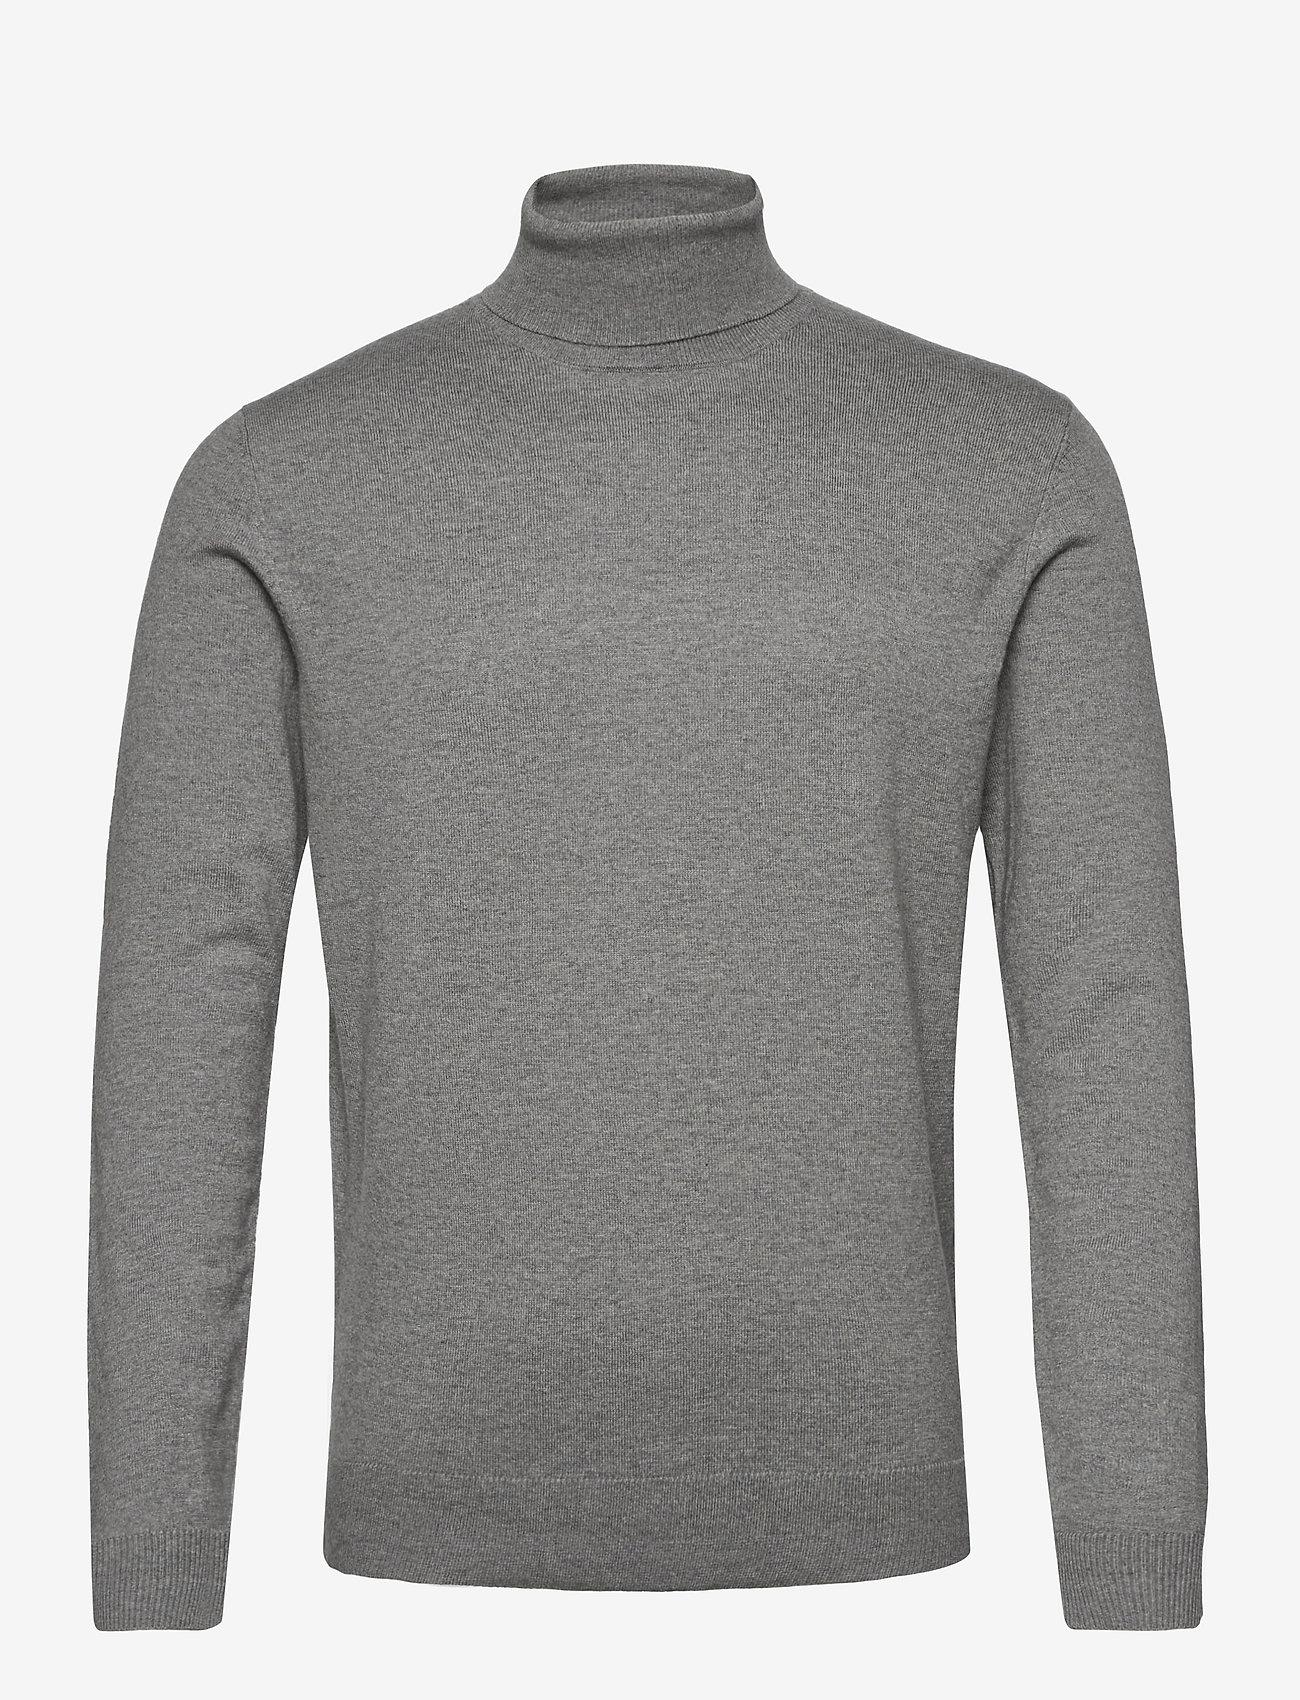 Esprit Casual - Sweaters - tricots basiques - medium grey 5 - 0